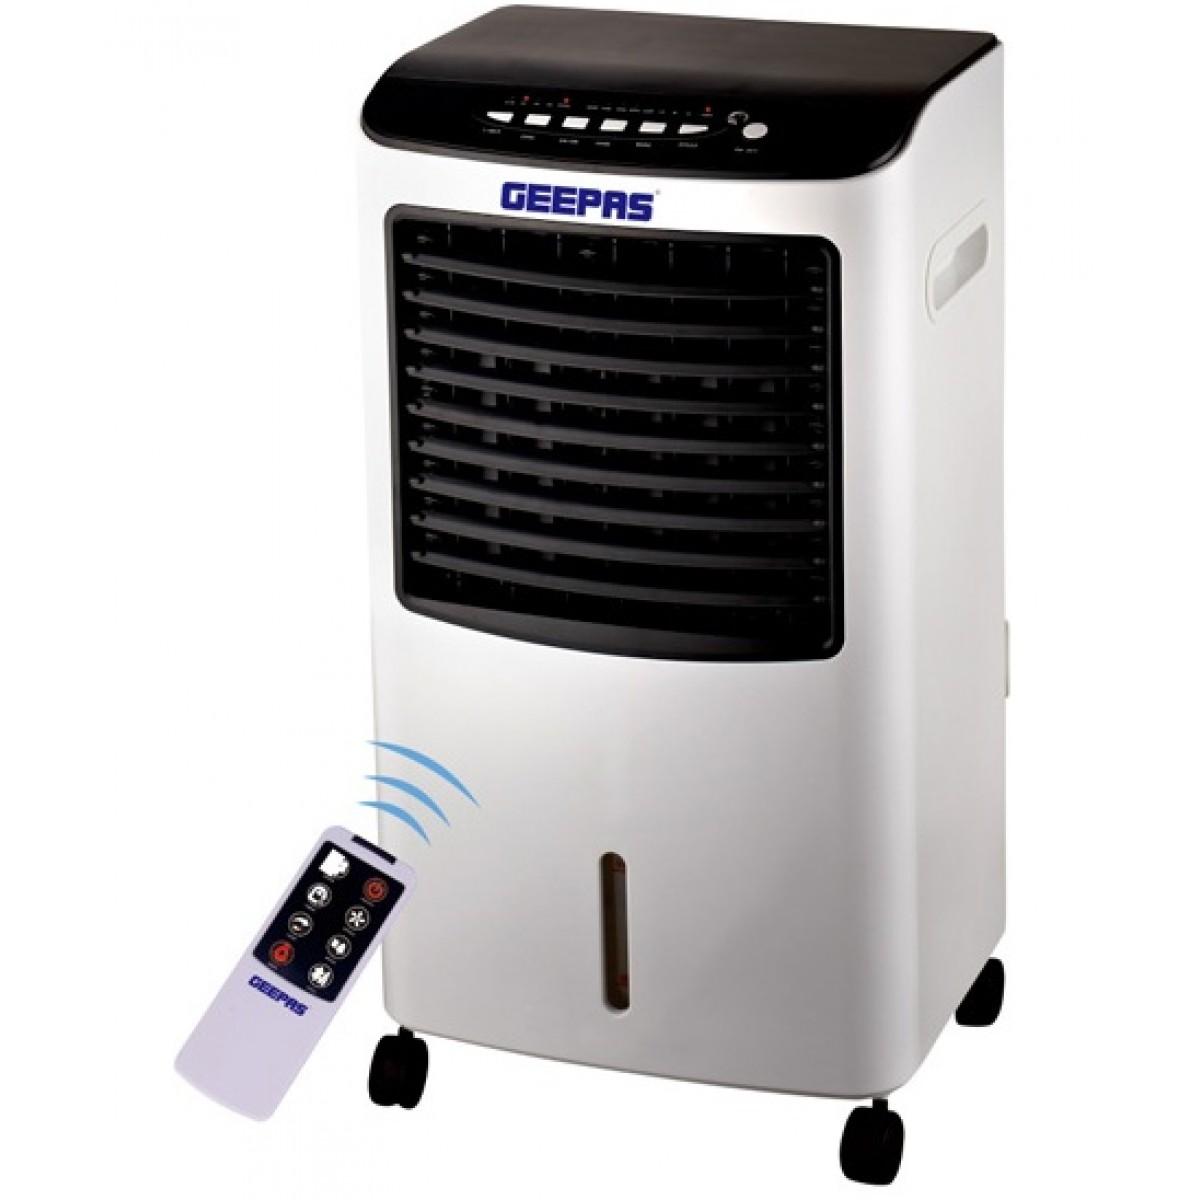 Geepas Air Cooler (GAC9460)